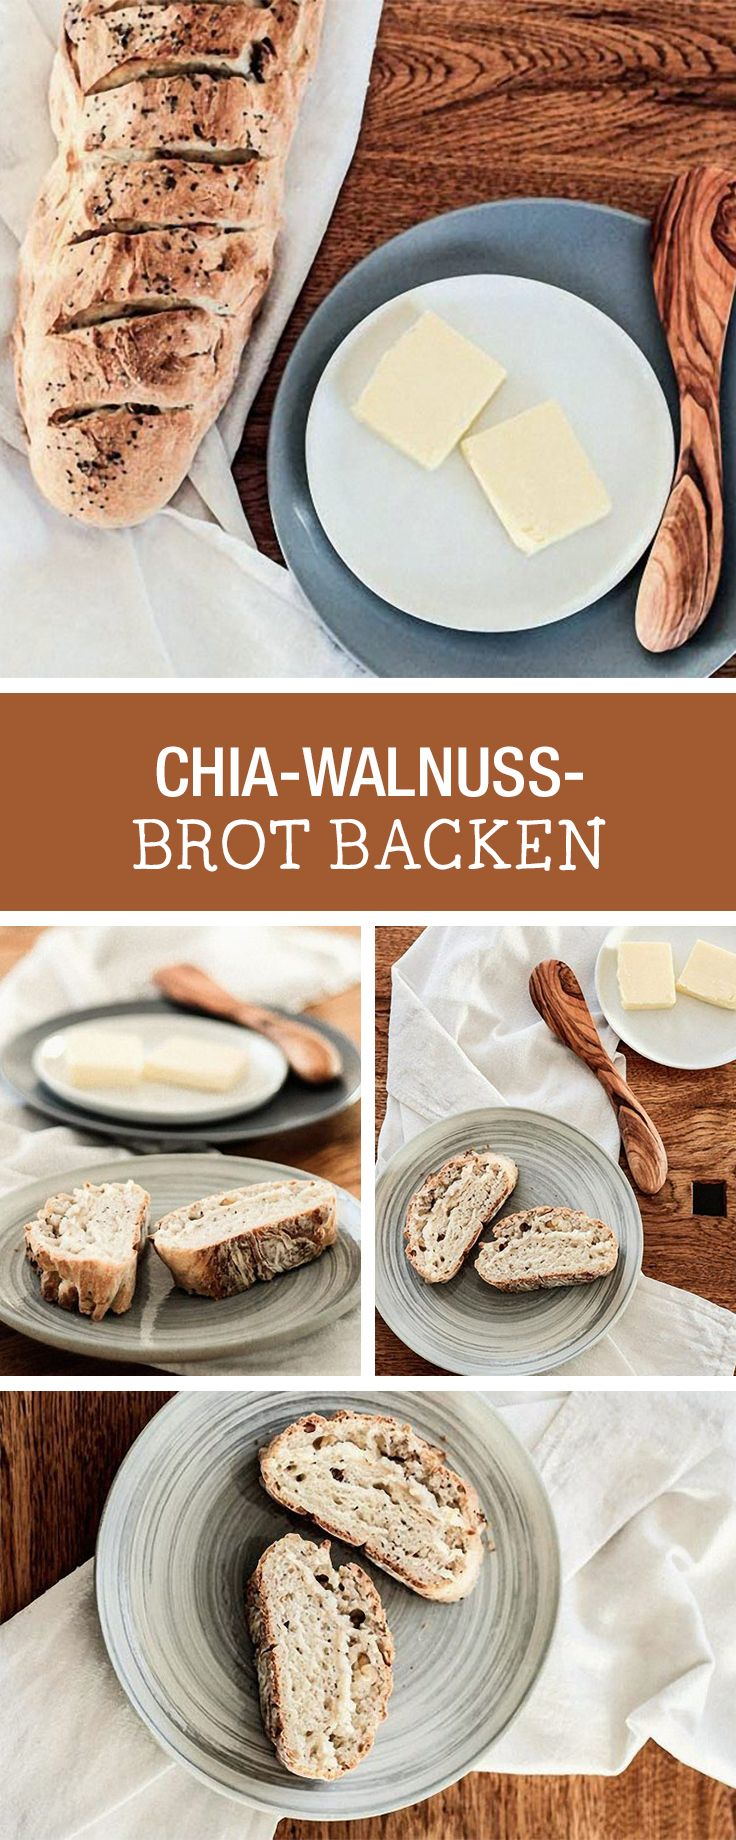 Gesundes Brot fürs Frühstück: Rezept für ein Chia-Walnuss-Brot / bake your own bread: recipe for ciabatta with walnuts and chia seeds via DaWanda.com